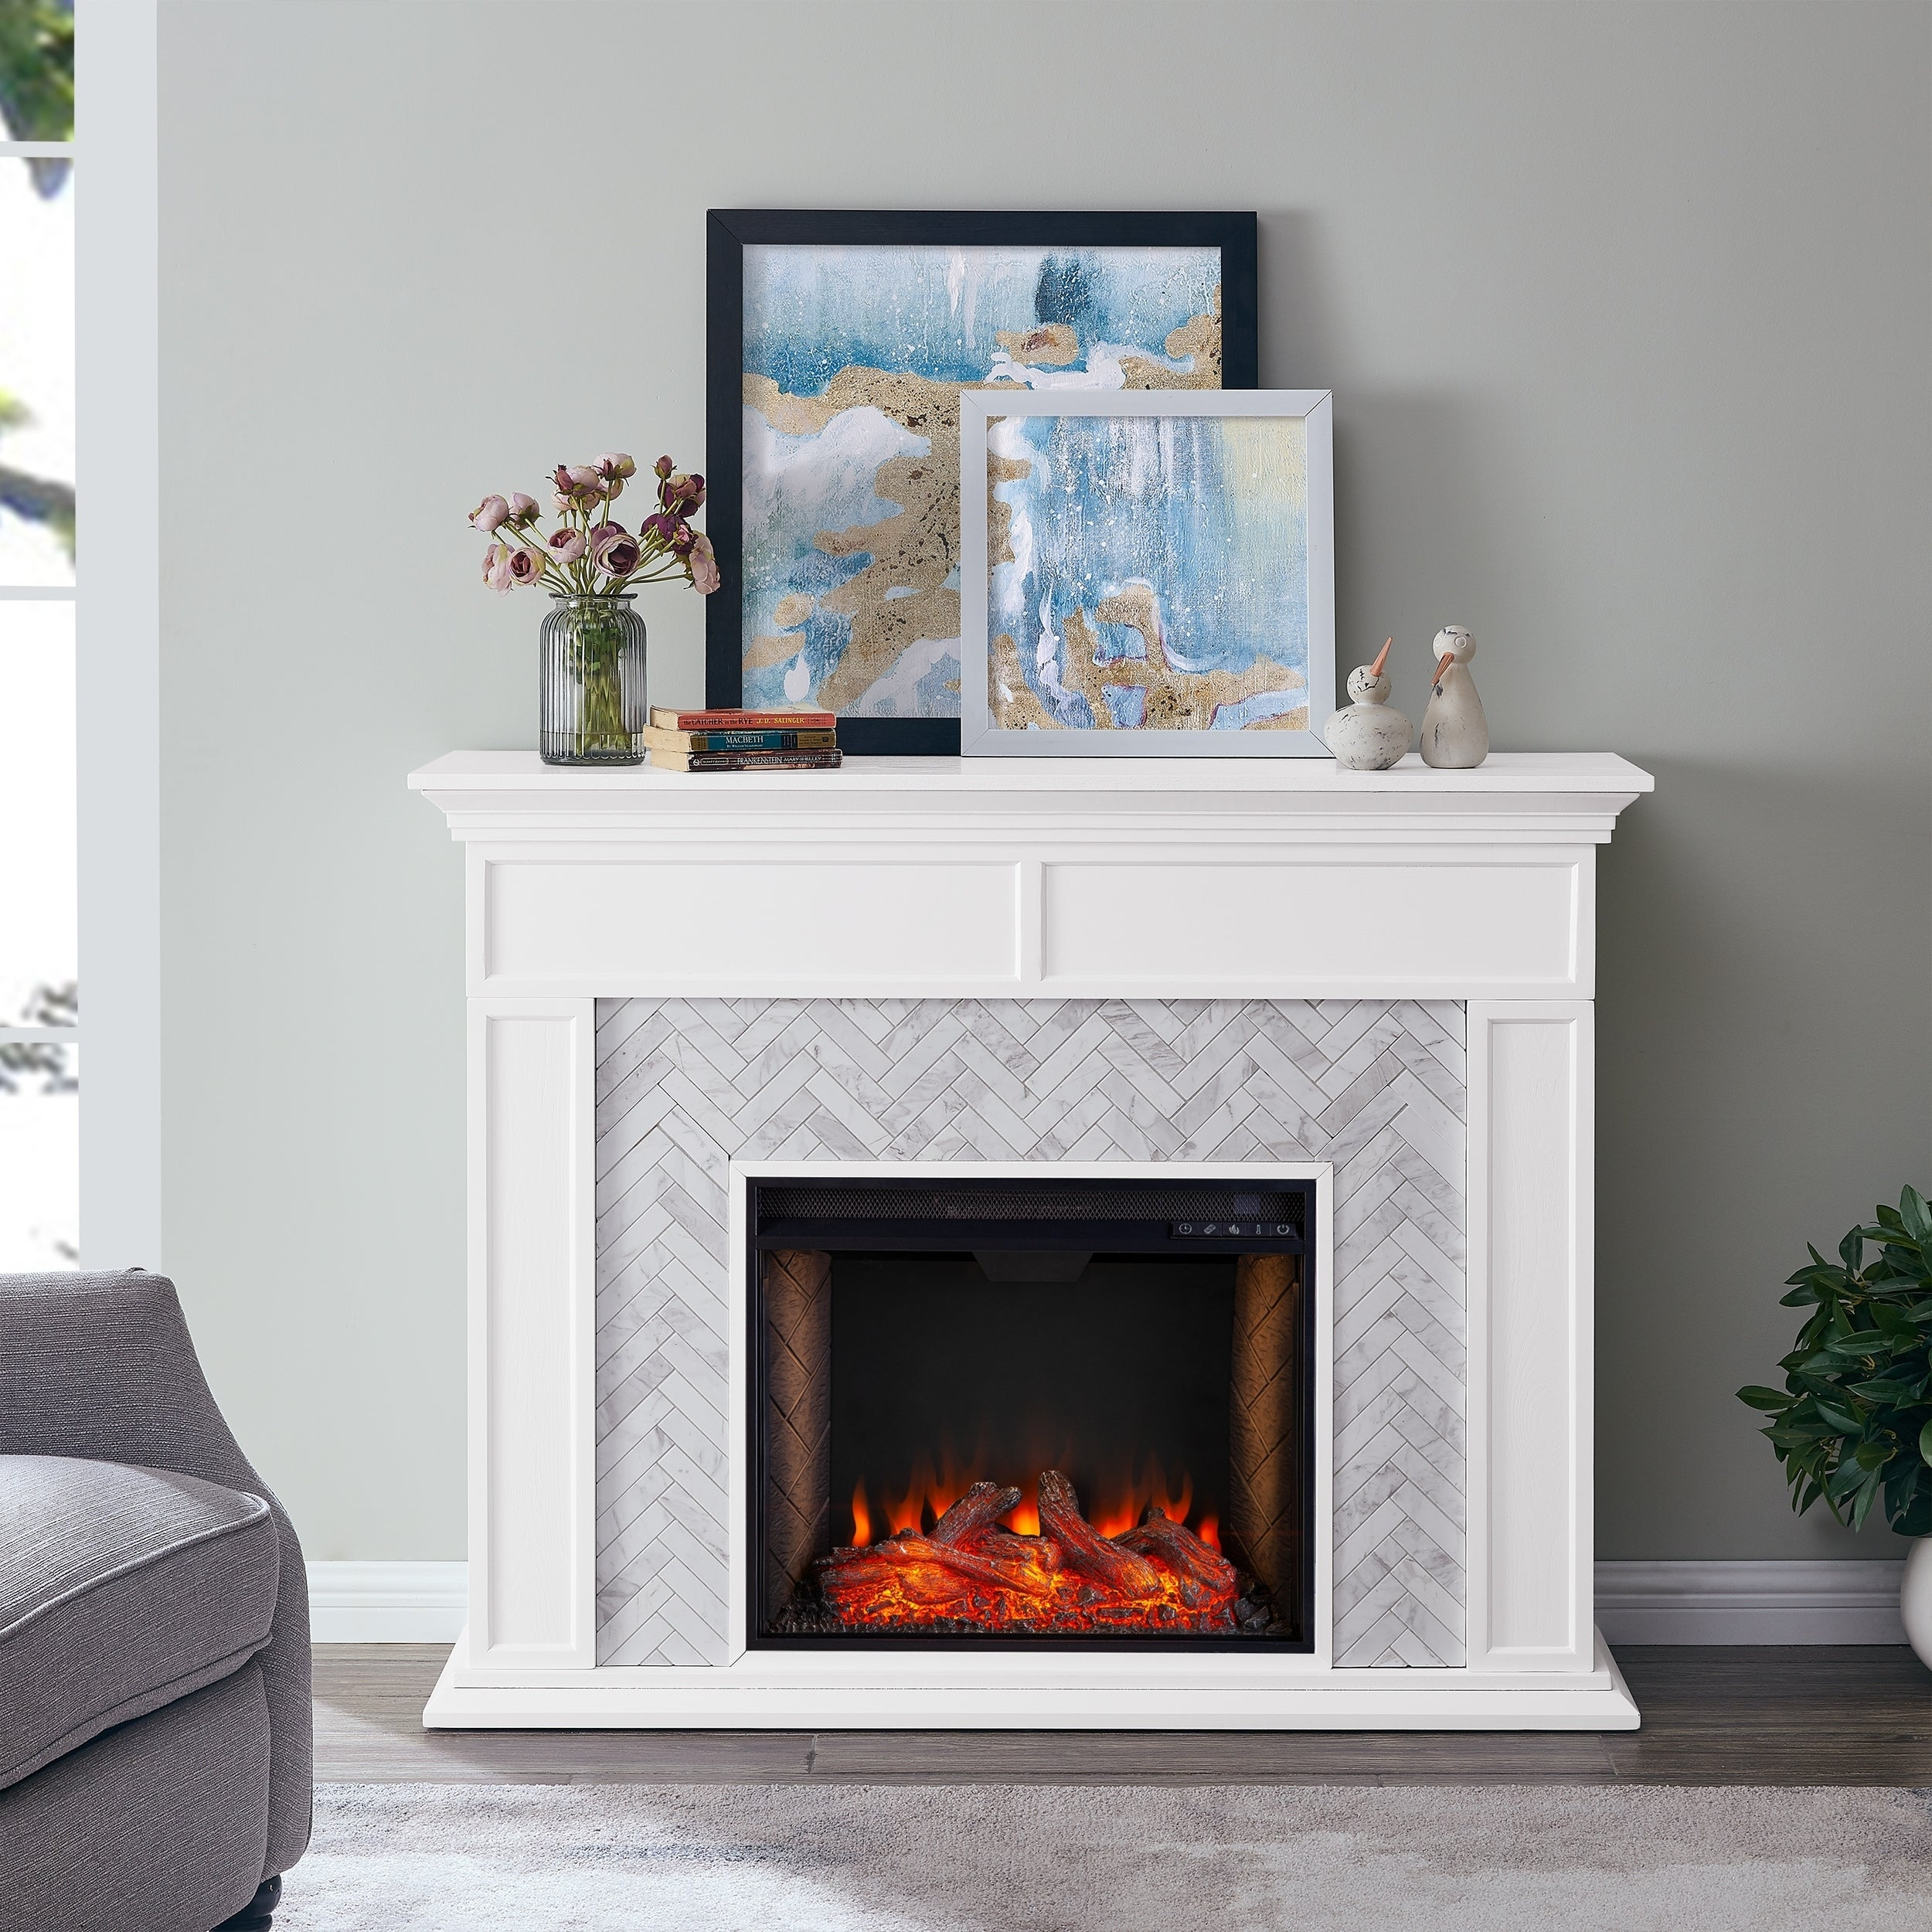 Harper Blvd Torton Contemporary White Alexa Enabled Wood Fireplace